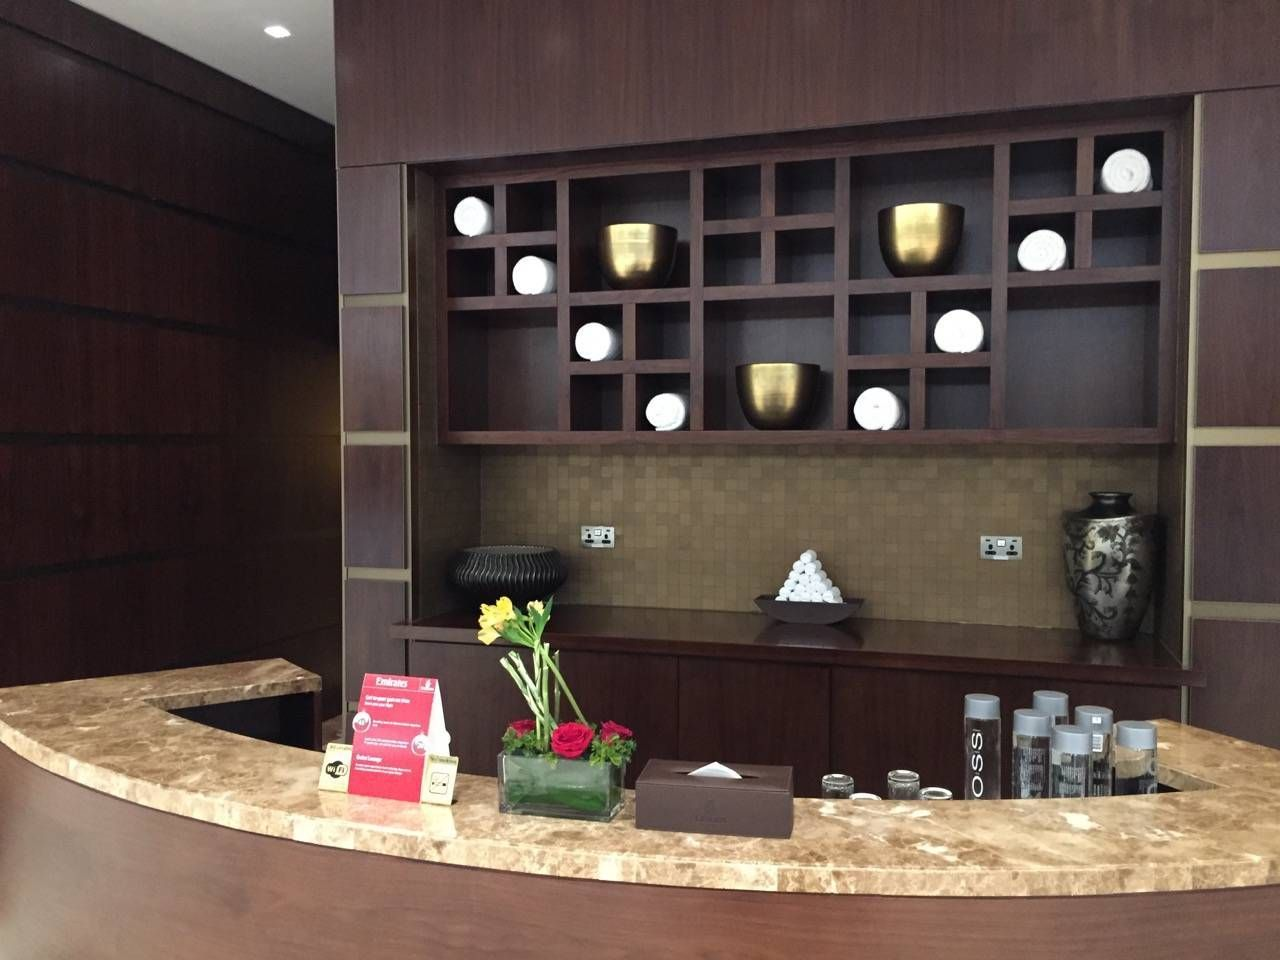 Emirates First Class Lounge Dubai -067